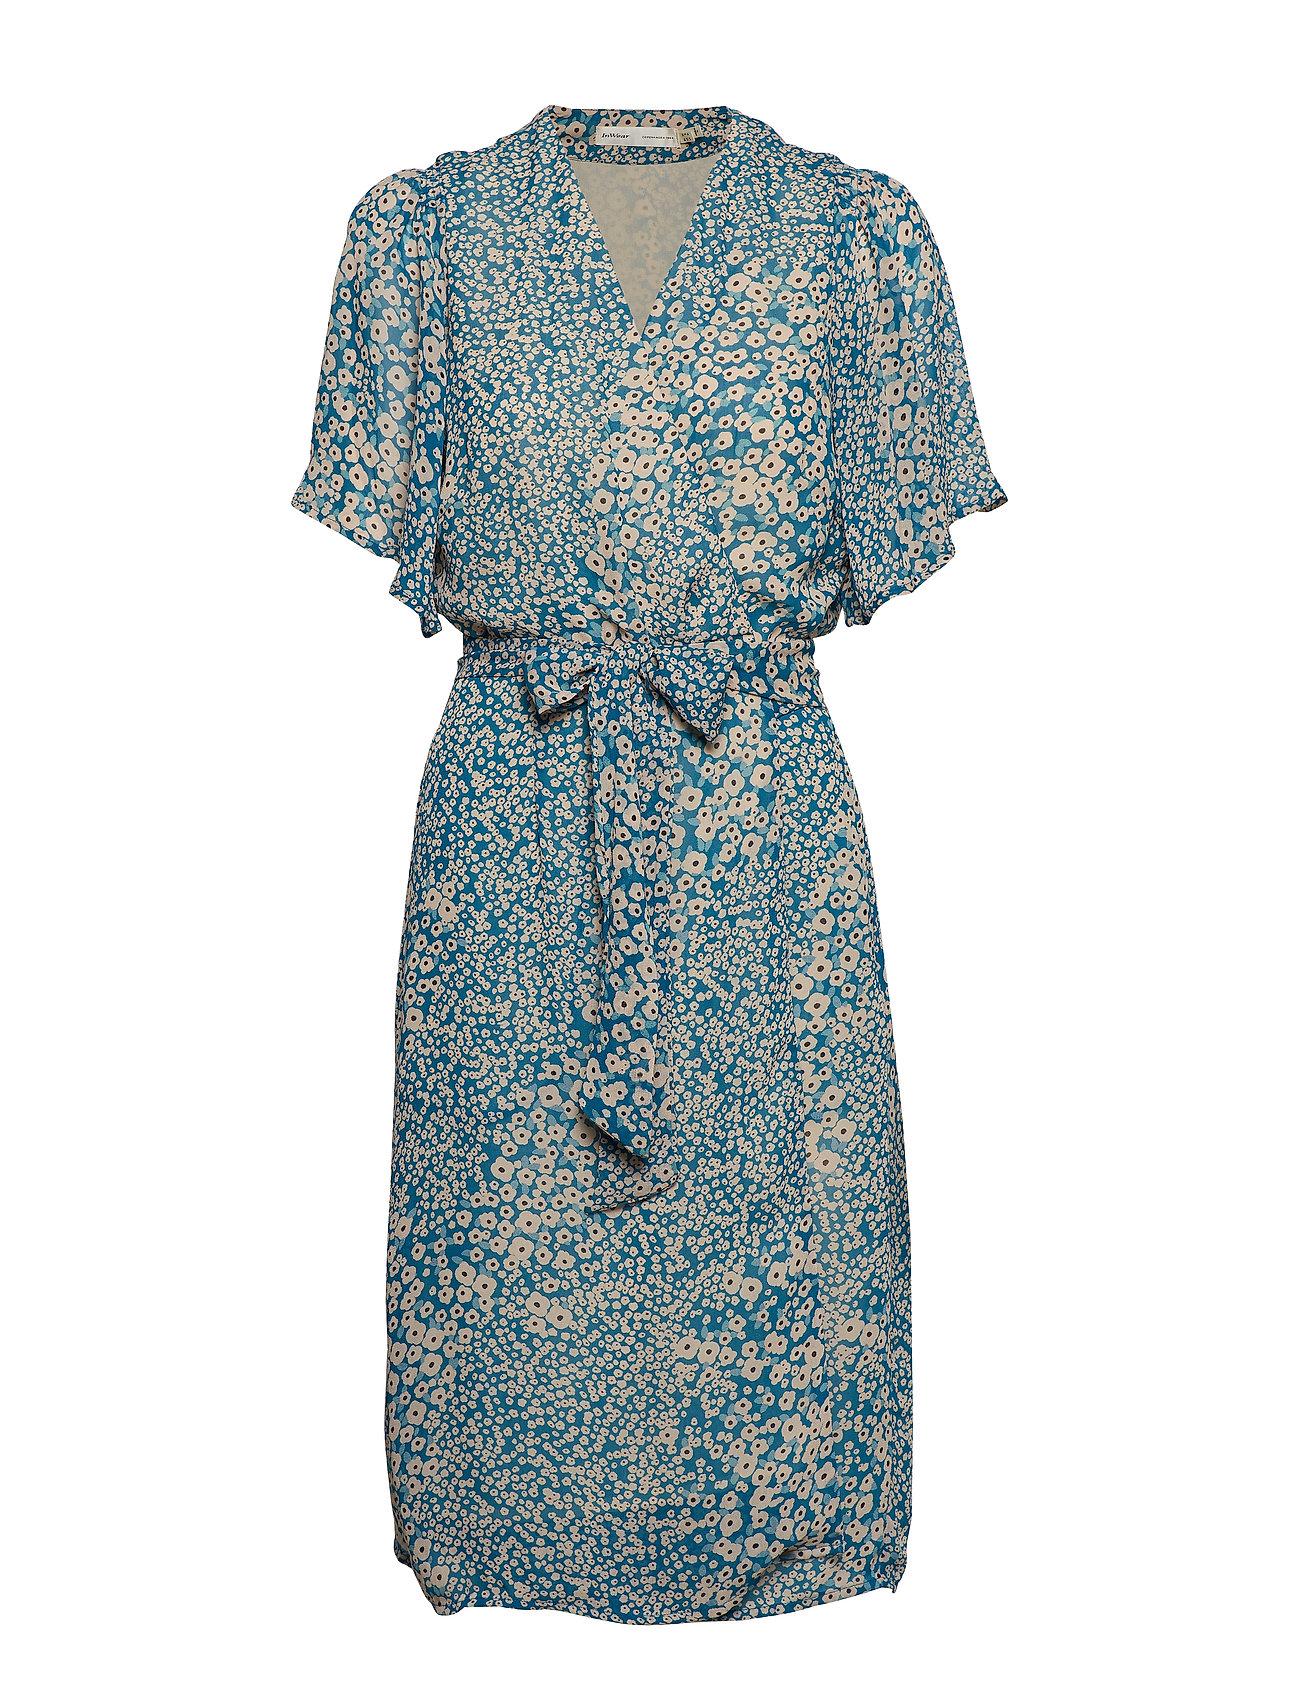 Dresspetrol FlowerInwear Tallyiw Dresspetrol Diagonal Tallyiw Blue LSzUMpGqV